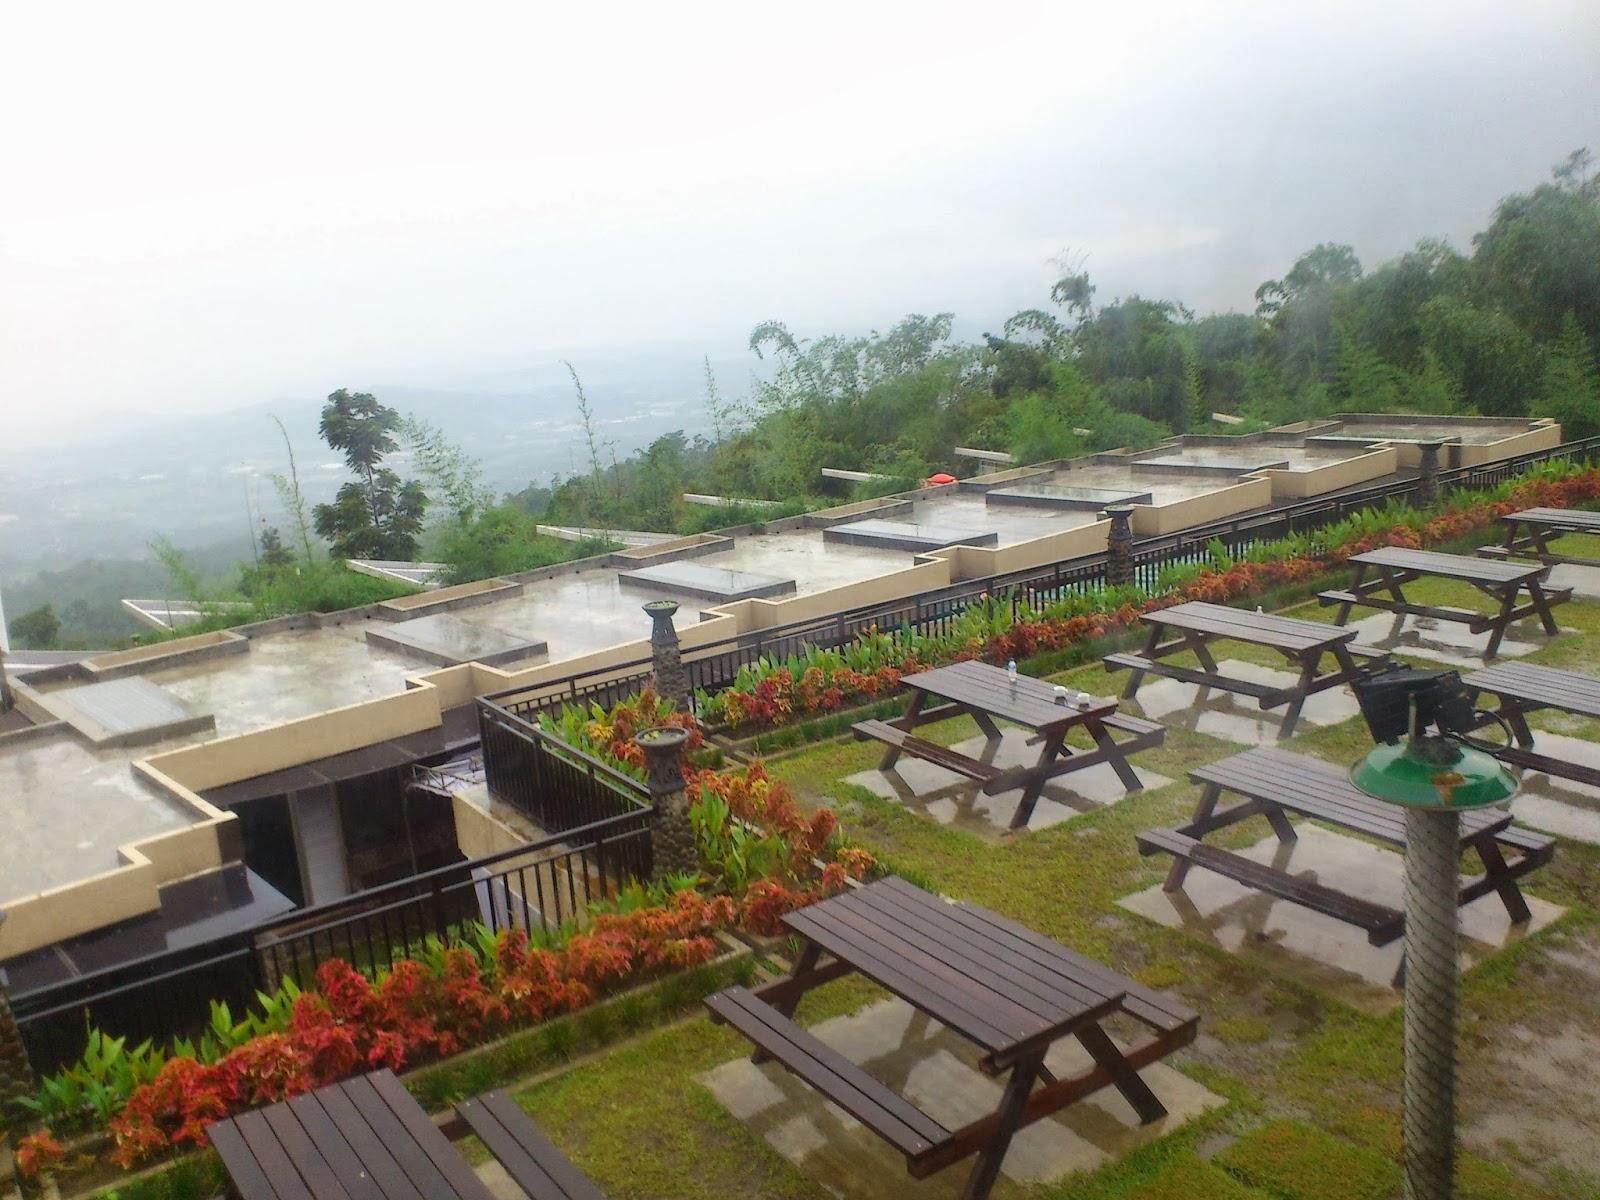 Info Umbul Sidomukti Semarang Kawasan Wisata Desa Kecamatan Bandungan Kab